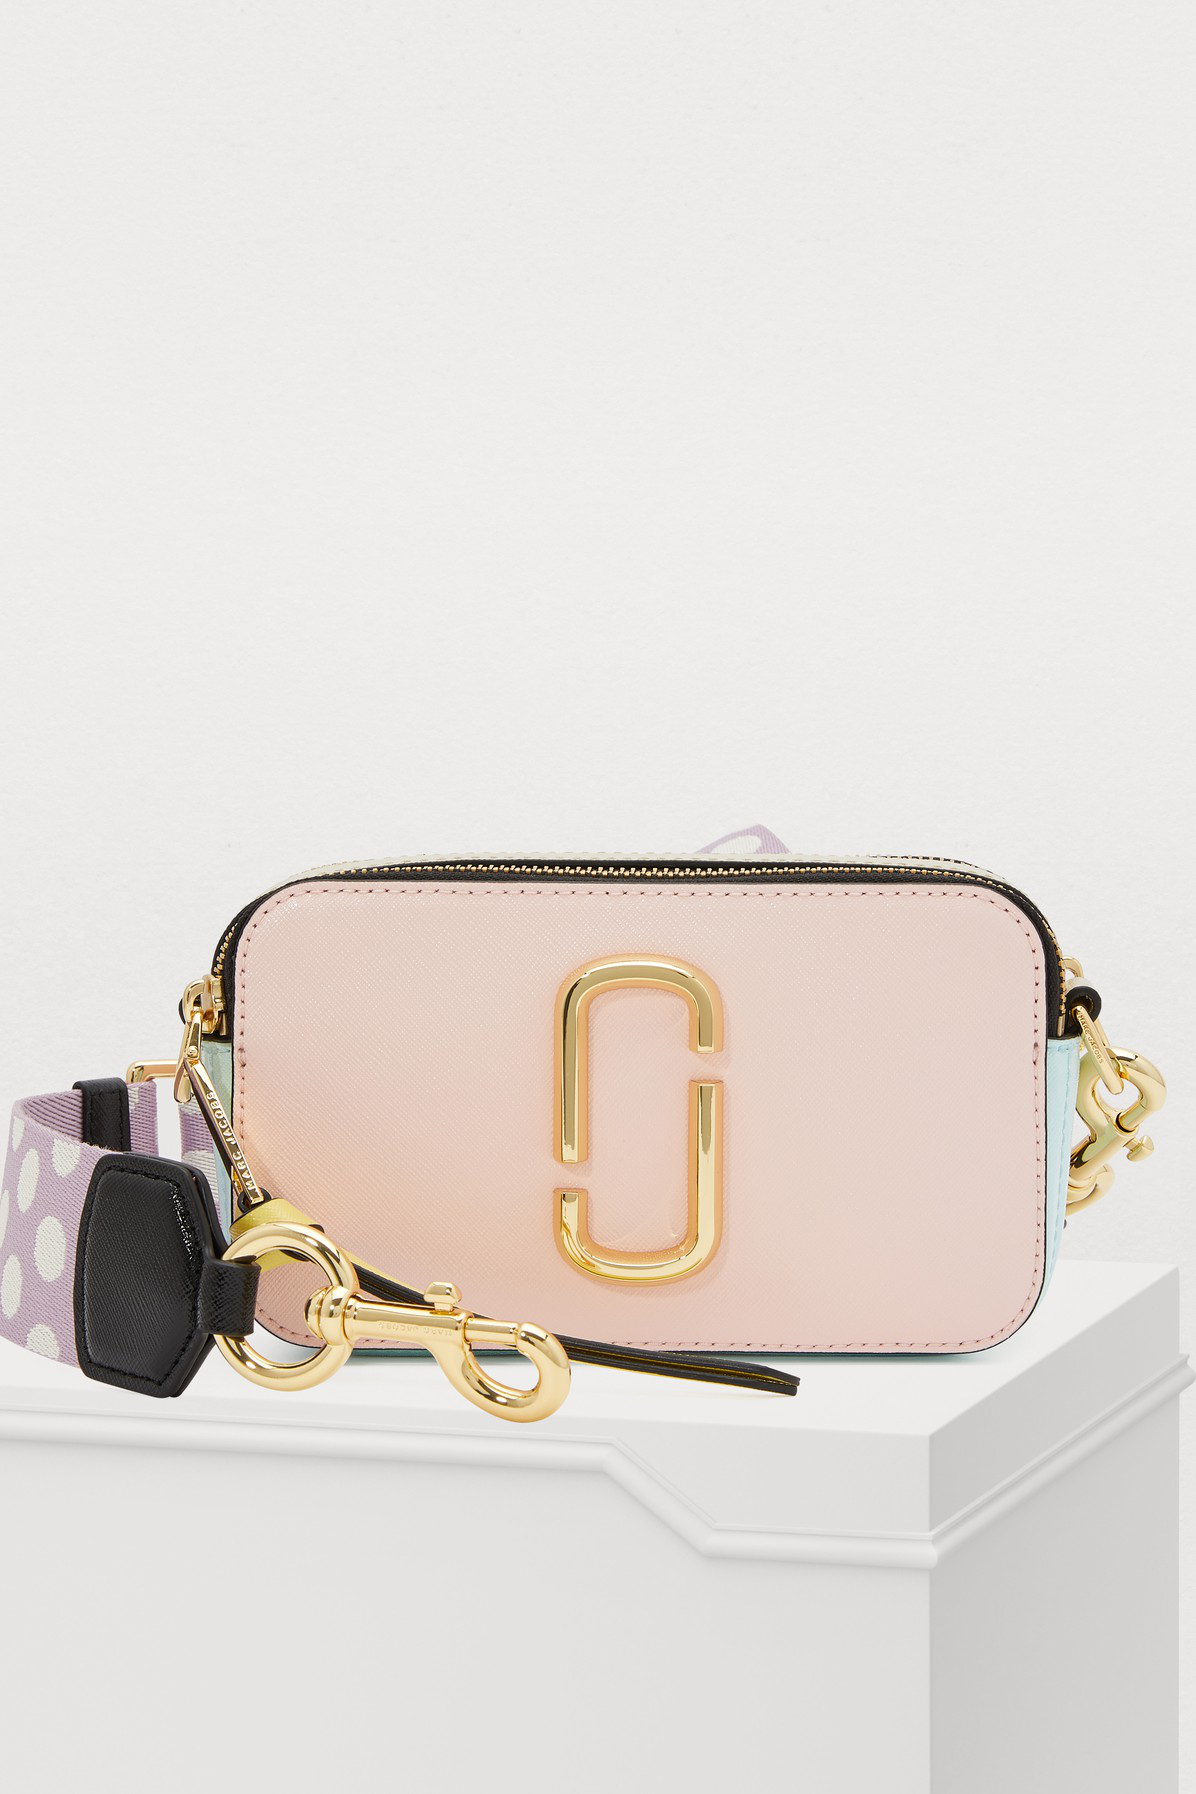 Marc Jacobs Snapshot Crossbody Bag In Blush Multi